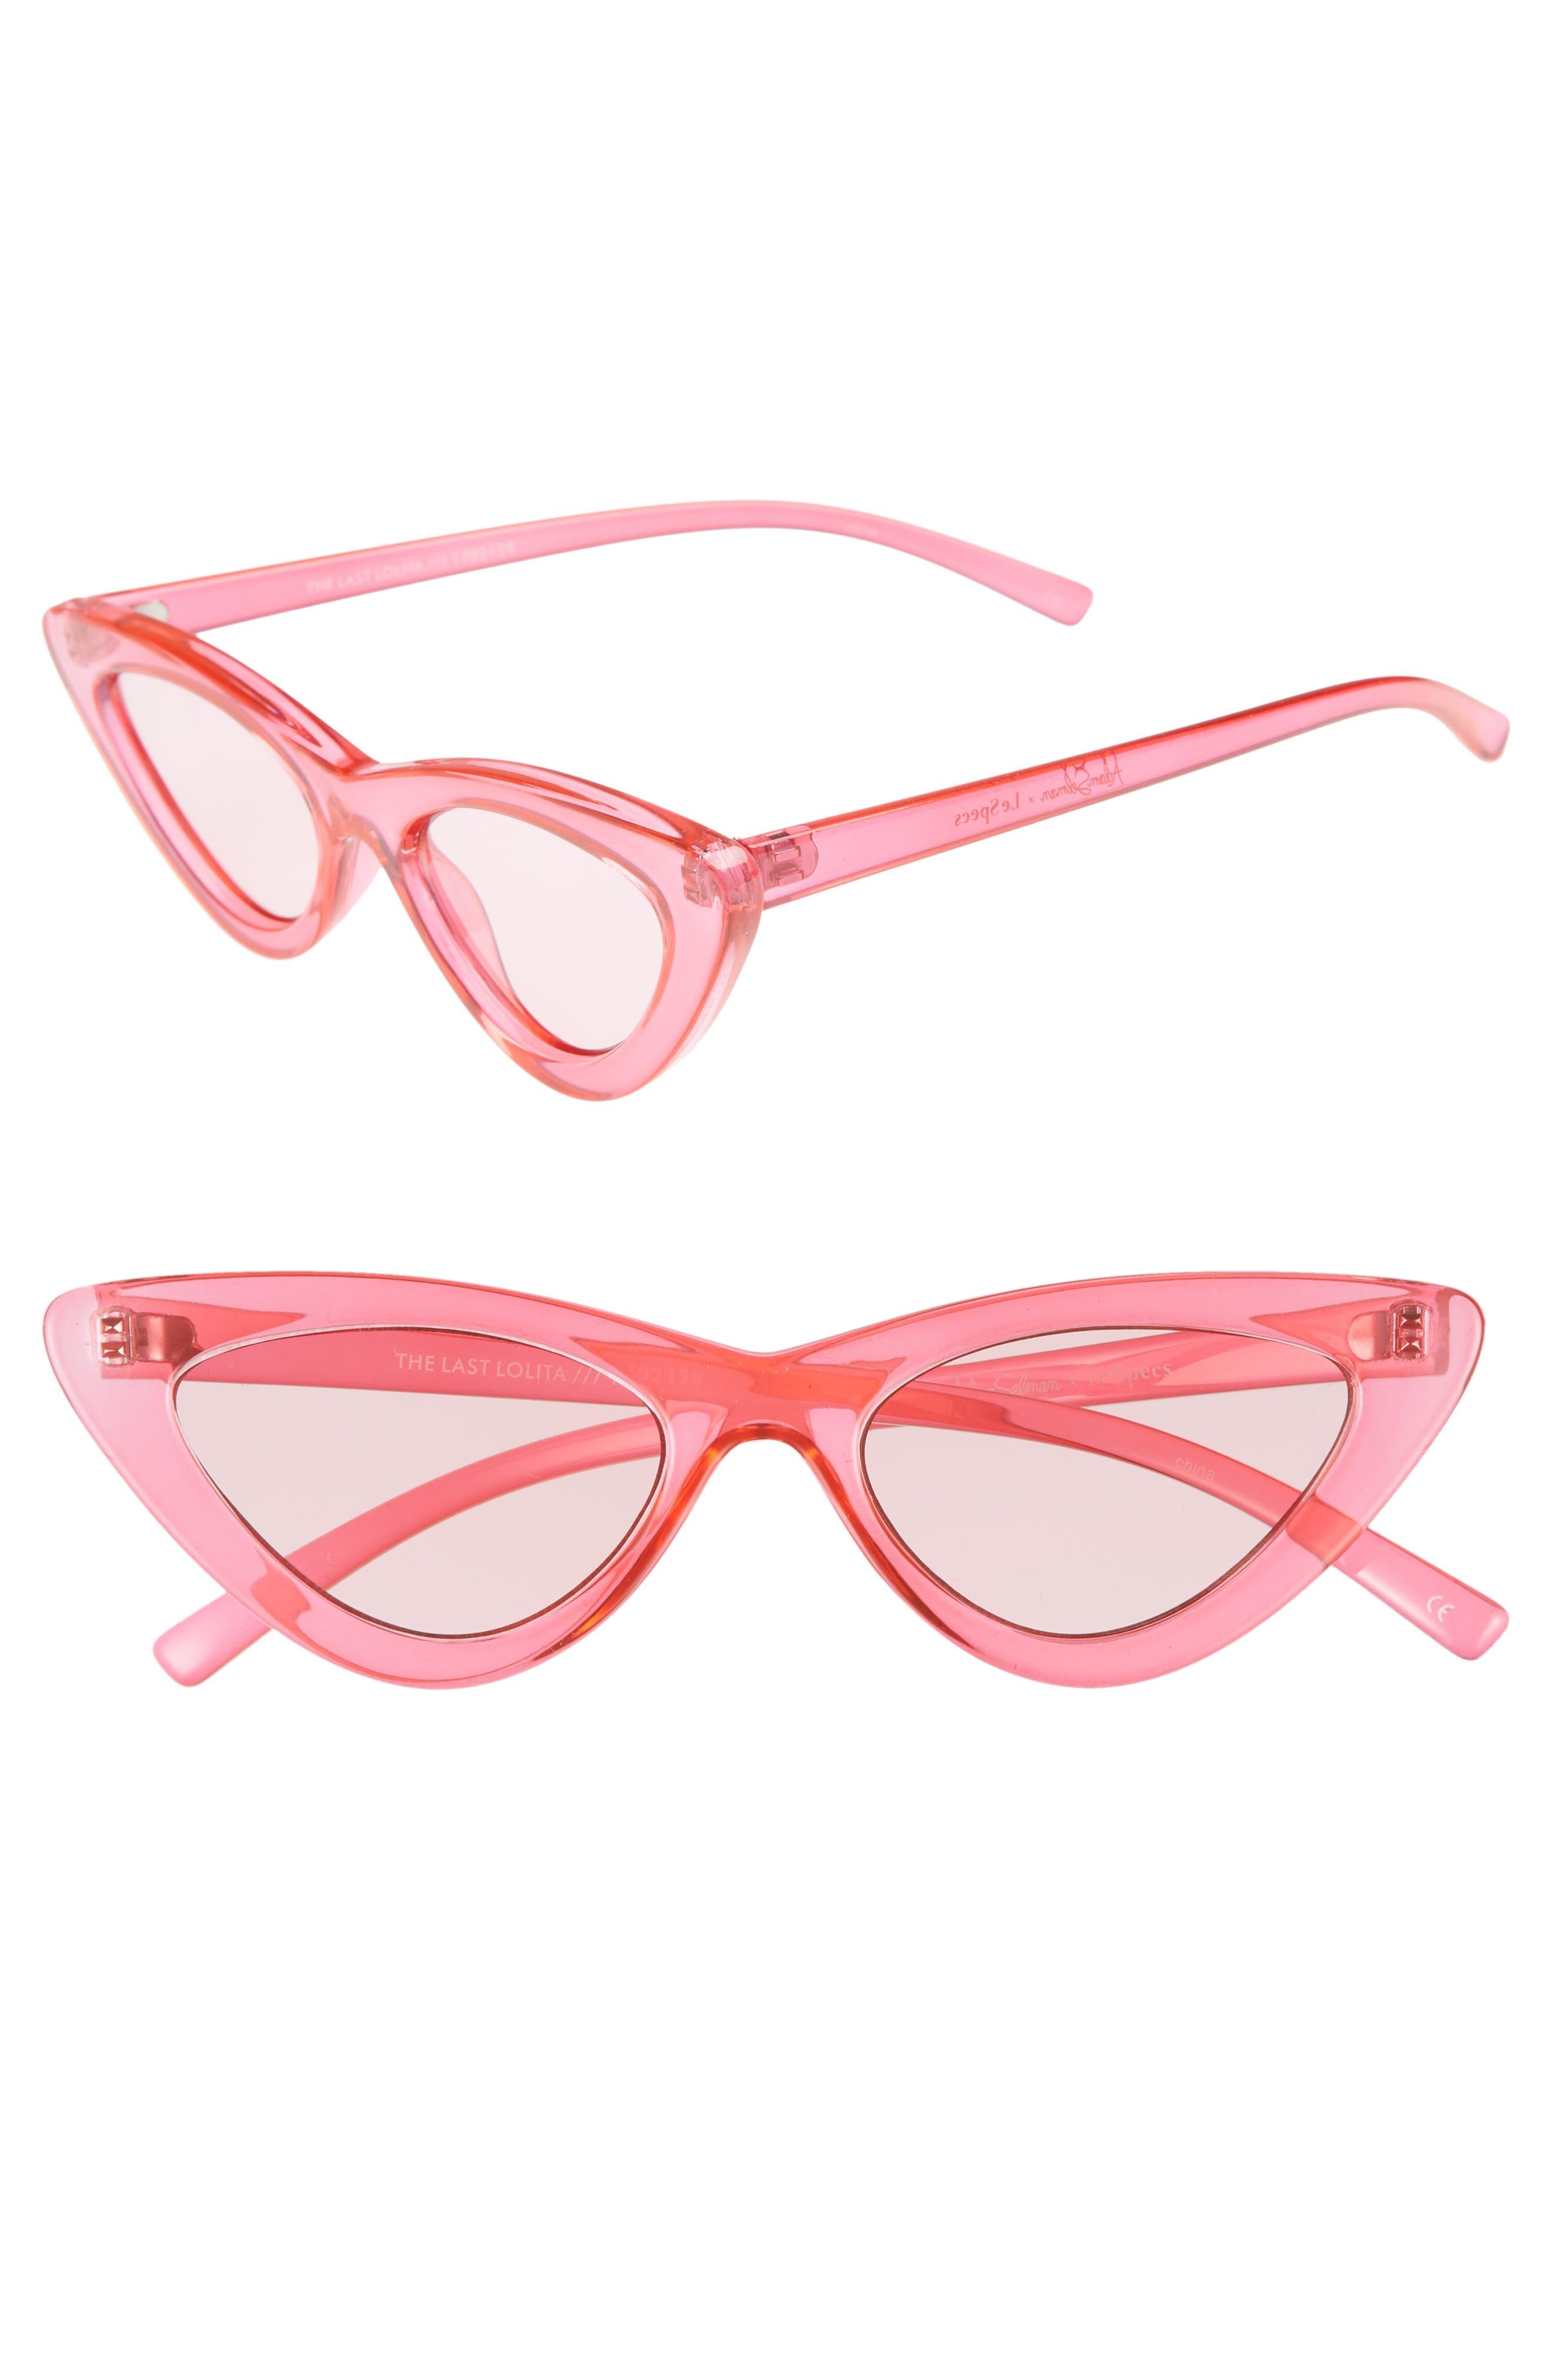 Adam Selman X Le Specs Luxe Lolita 4m Cat Eye Sunglasses - Hot Pink